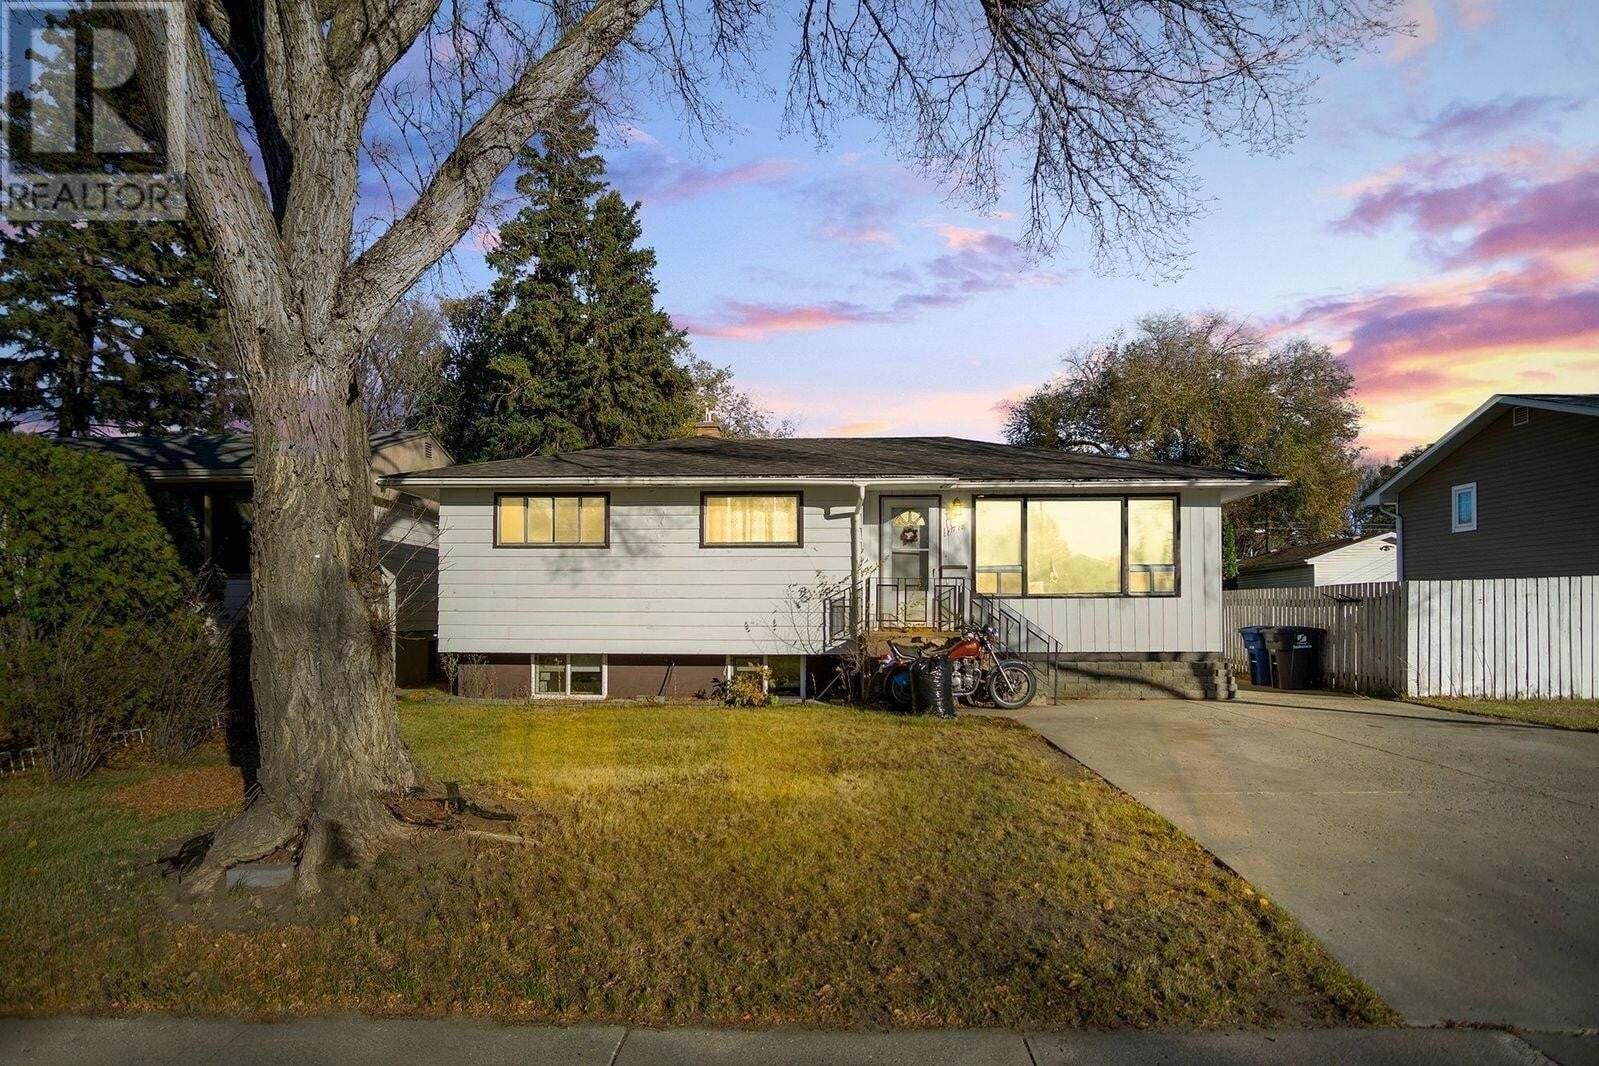 House for sale at 1718 E Ave N Saskatoon Saskatchewan - MLS: SK830640